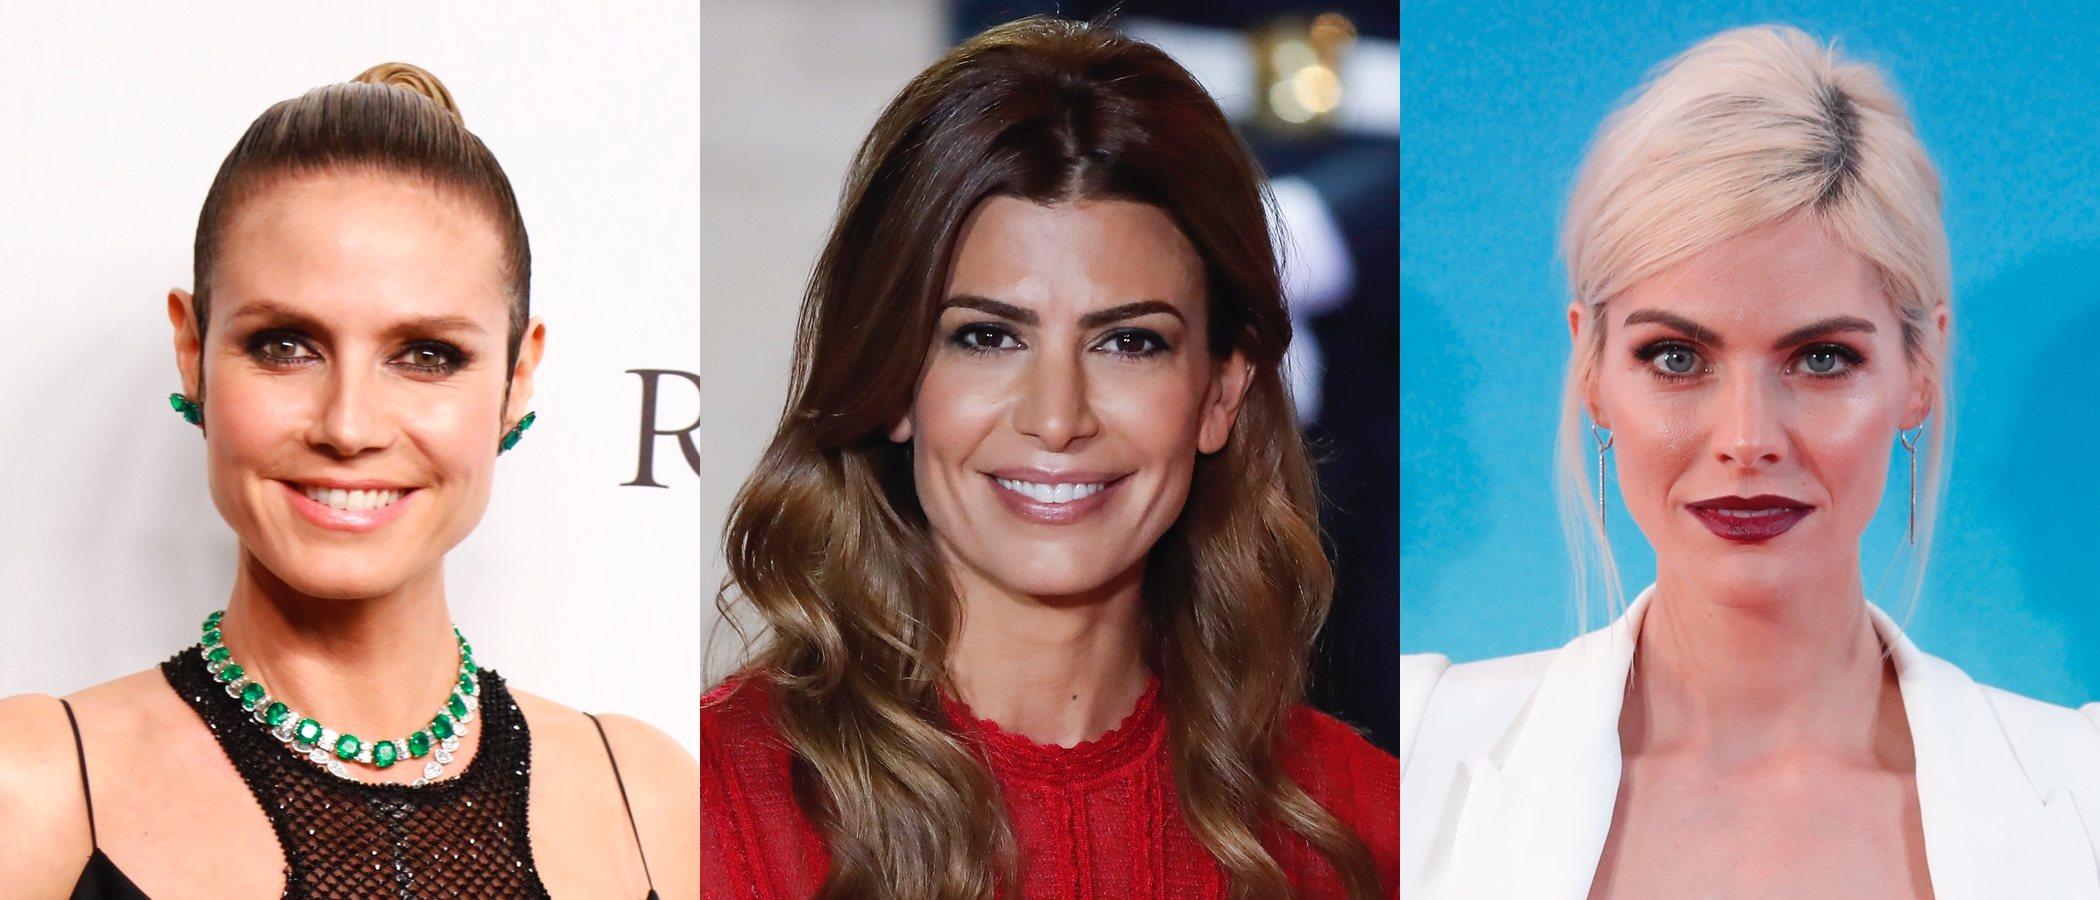 Heidi Klum, Juliana Awada y Amaia Salamanca nos traen los mejores beauty looks de la semana